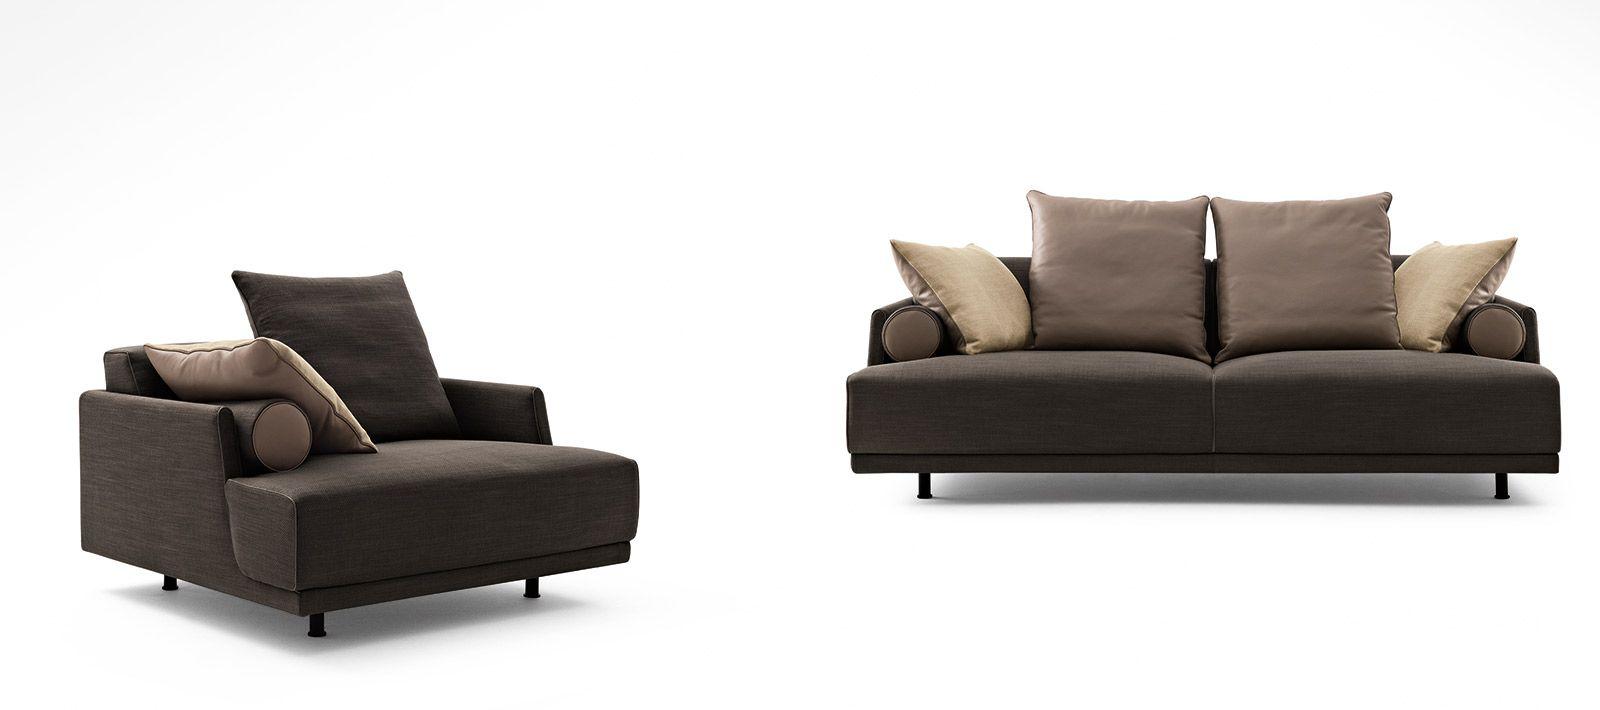 Loveseat option Maharaja Sofa, Sofa design